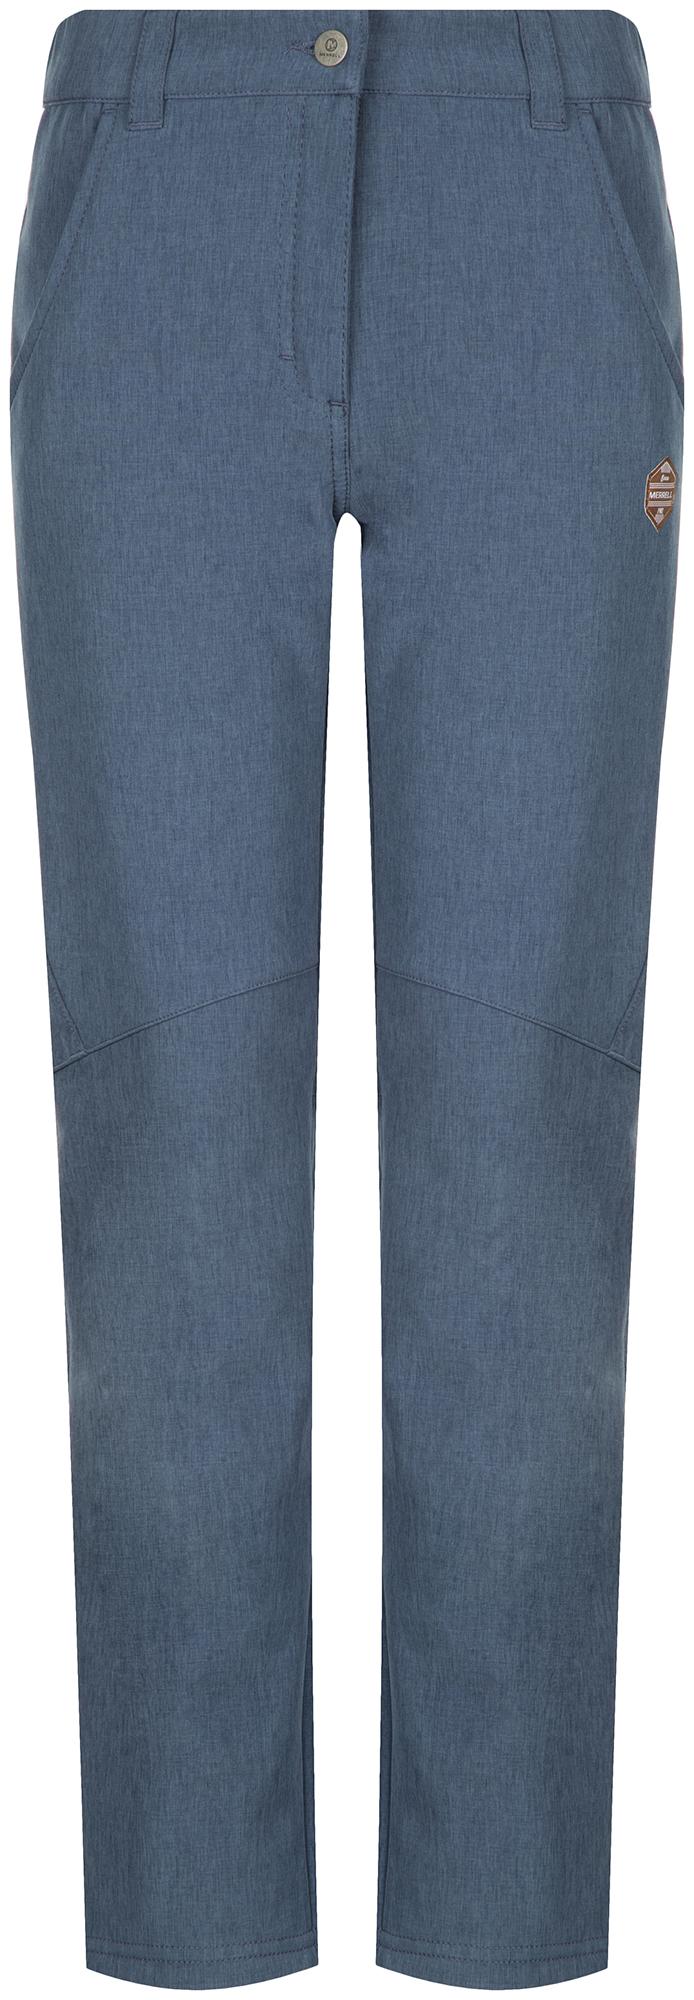 Merrell Брюки софтшелл для девочек Merrell, размер 170 брюки для мальчика stenser б49а 46 170 темно синий 46 170 размер